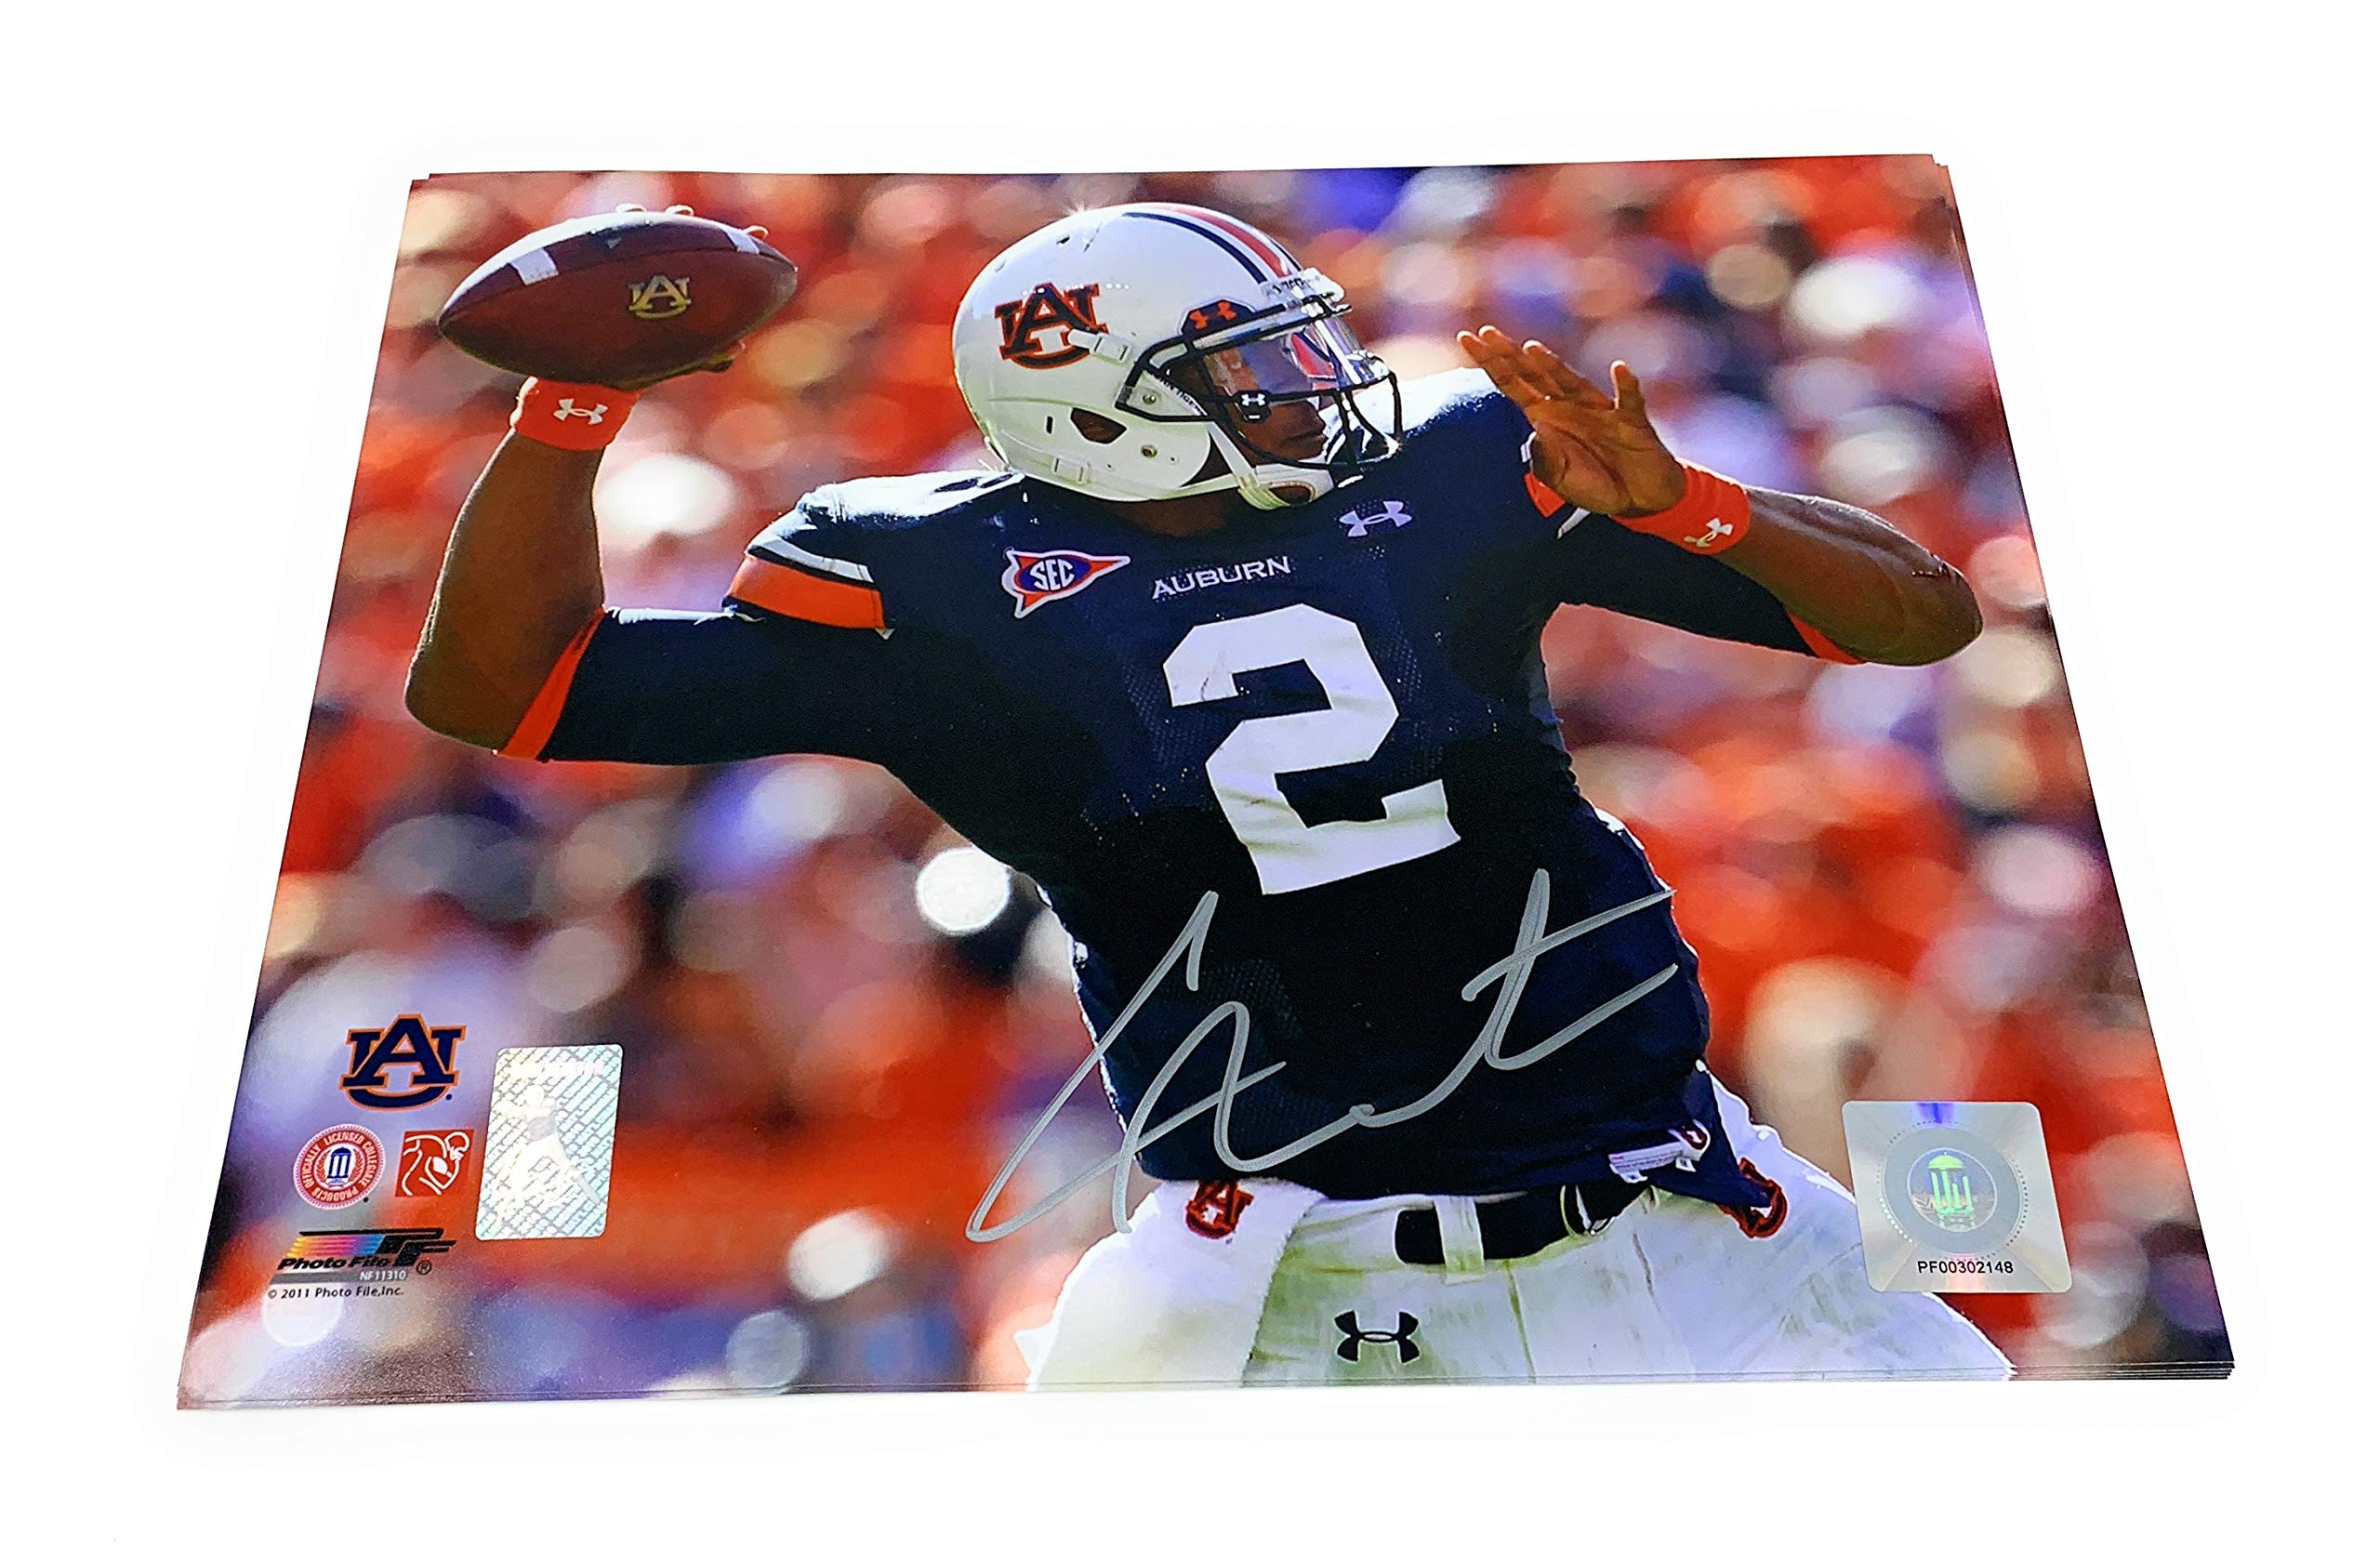 Cam Newton Auburn Tigers Signed Autograph 8x10 Photo Photograph GTSM Newton Player Hologram Certified